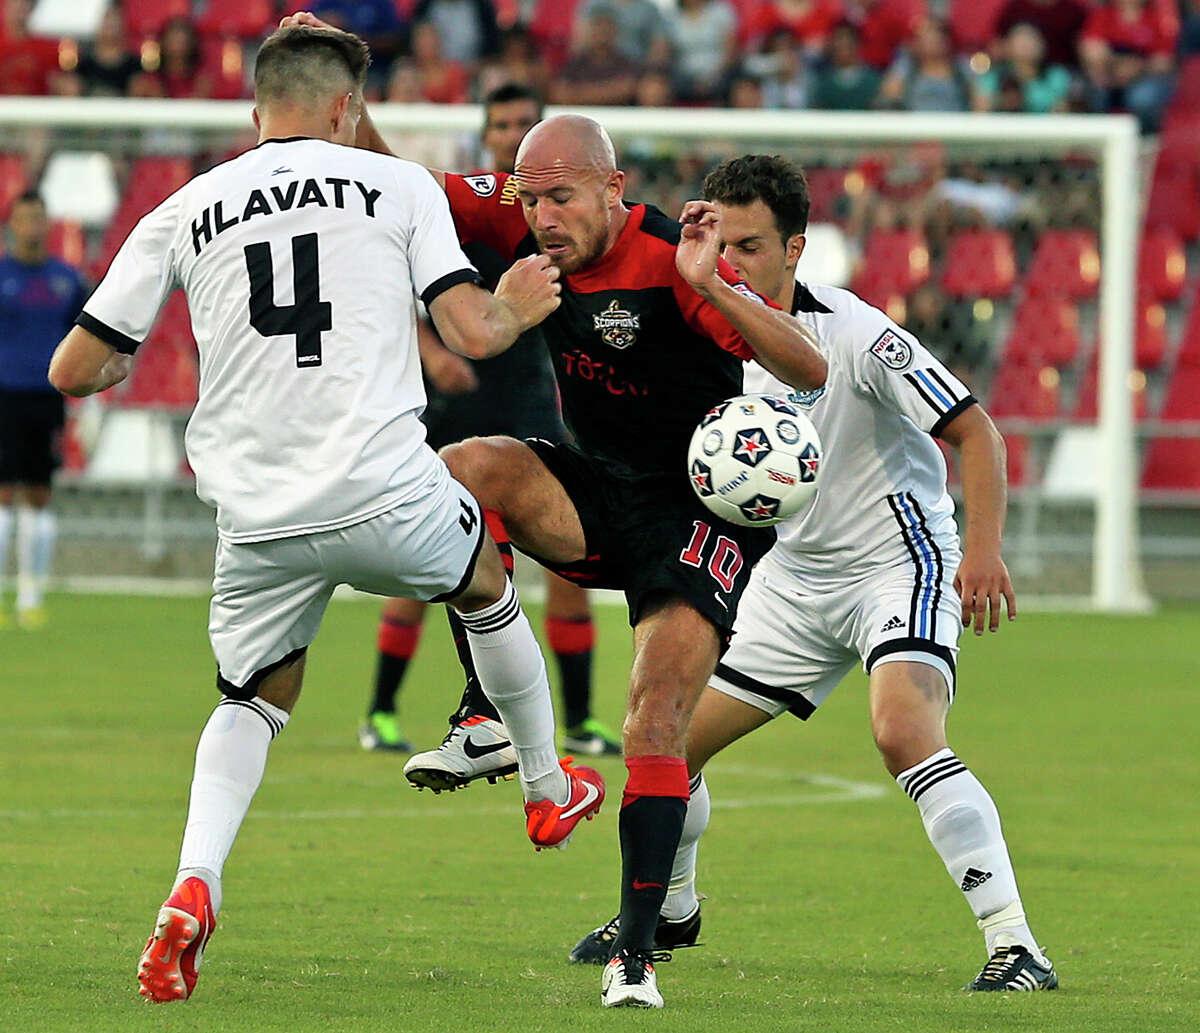 Hans Denissen squeezes the ball away from defenders as the San Antonio Scorpions host FC Edmonton on June 22, 2013.